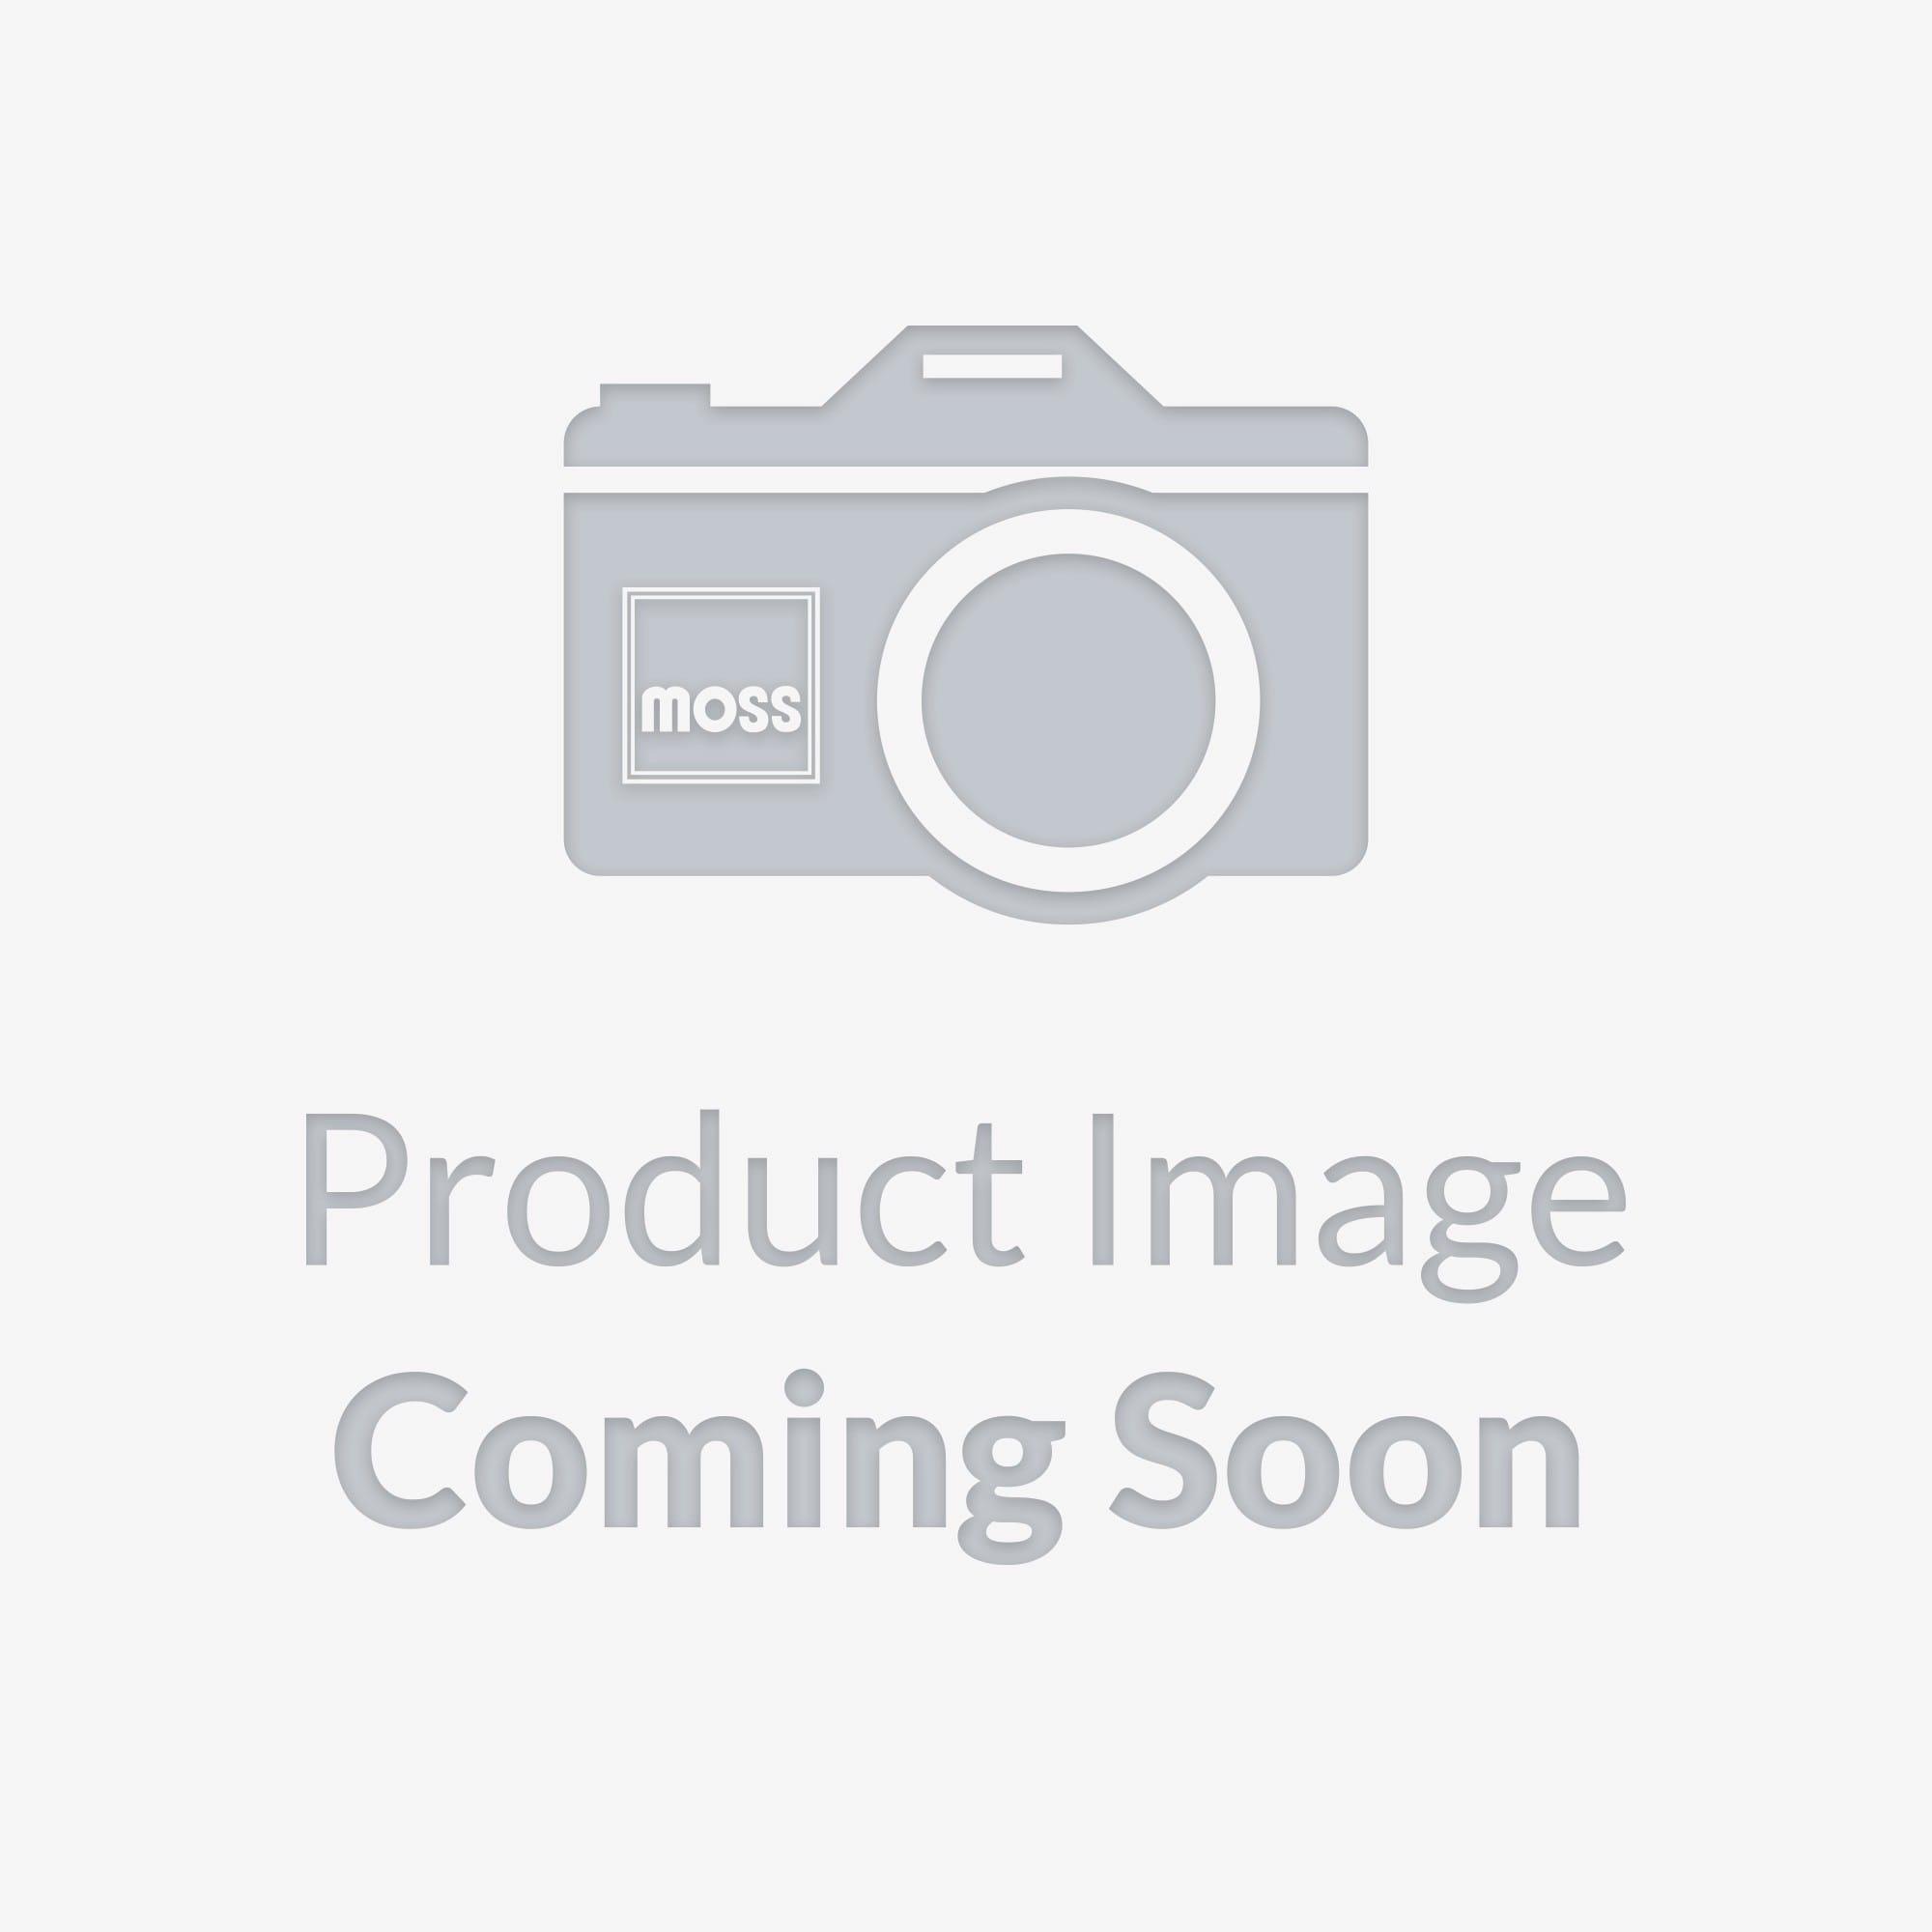 Zafira B Wiring Harness Repair Kit : Wiring harness repair kits electrical ignition